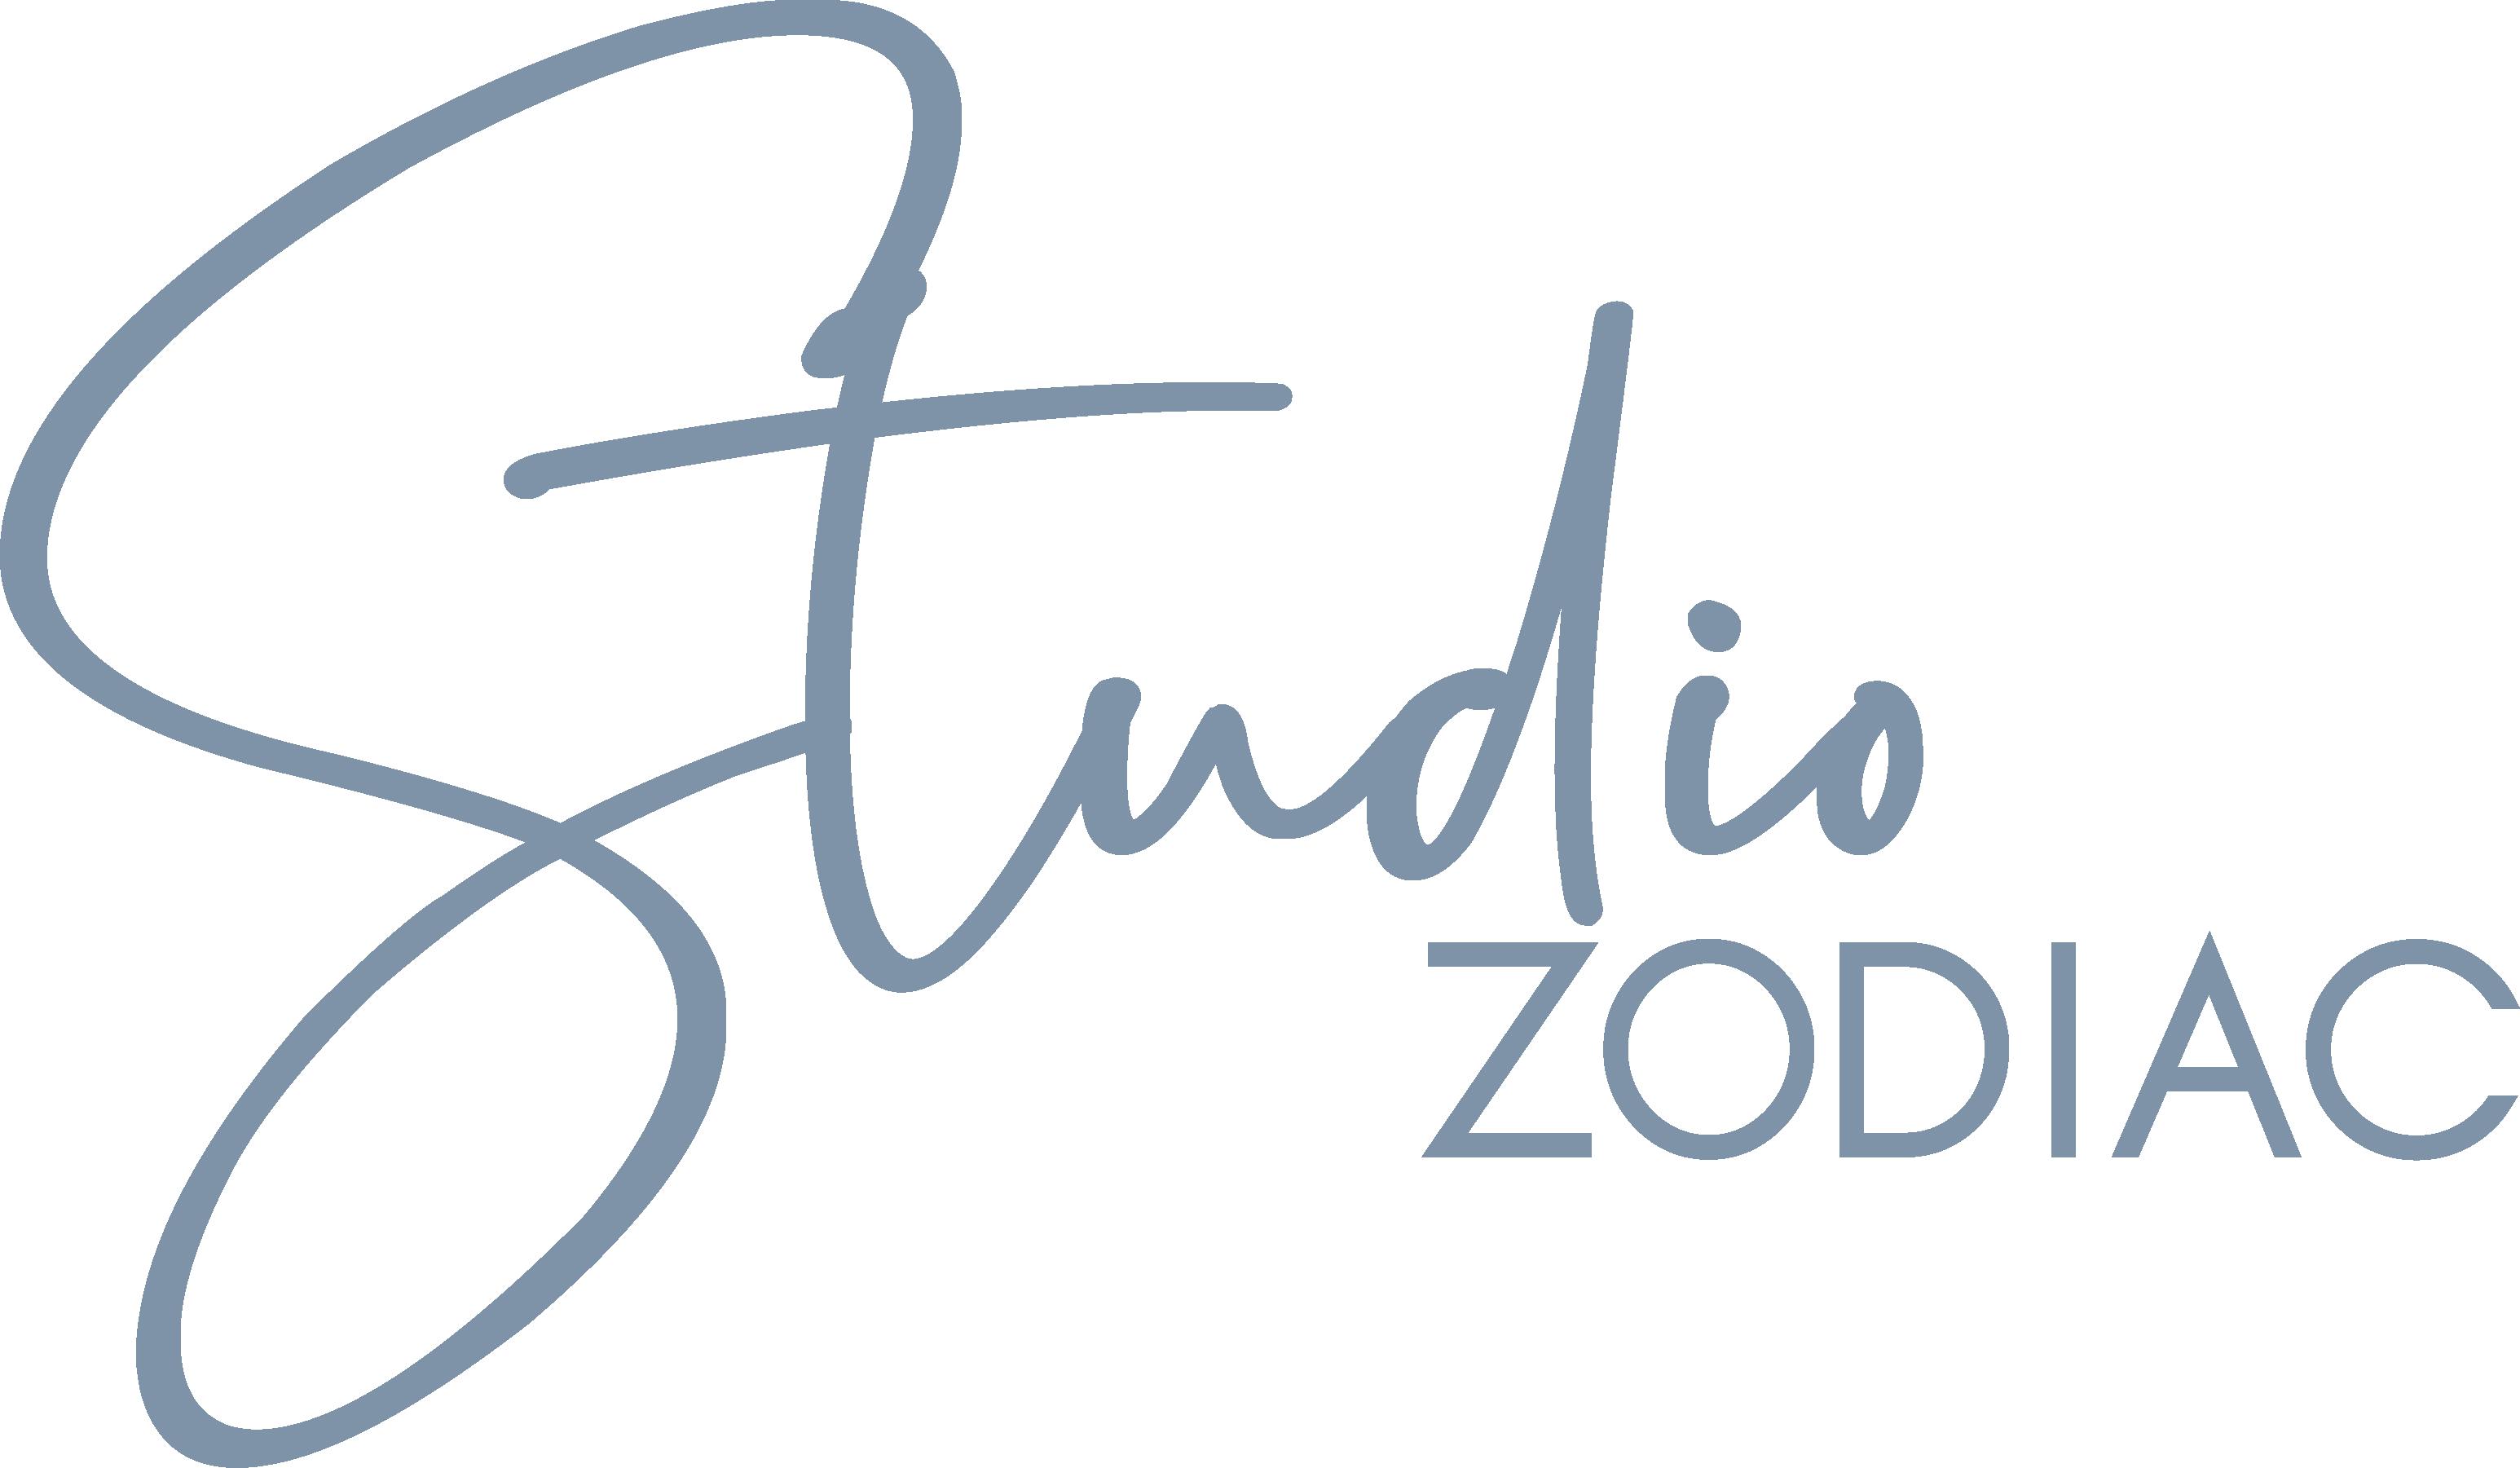 Studio Zodiac